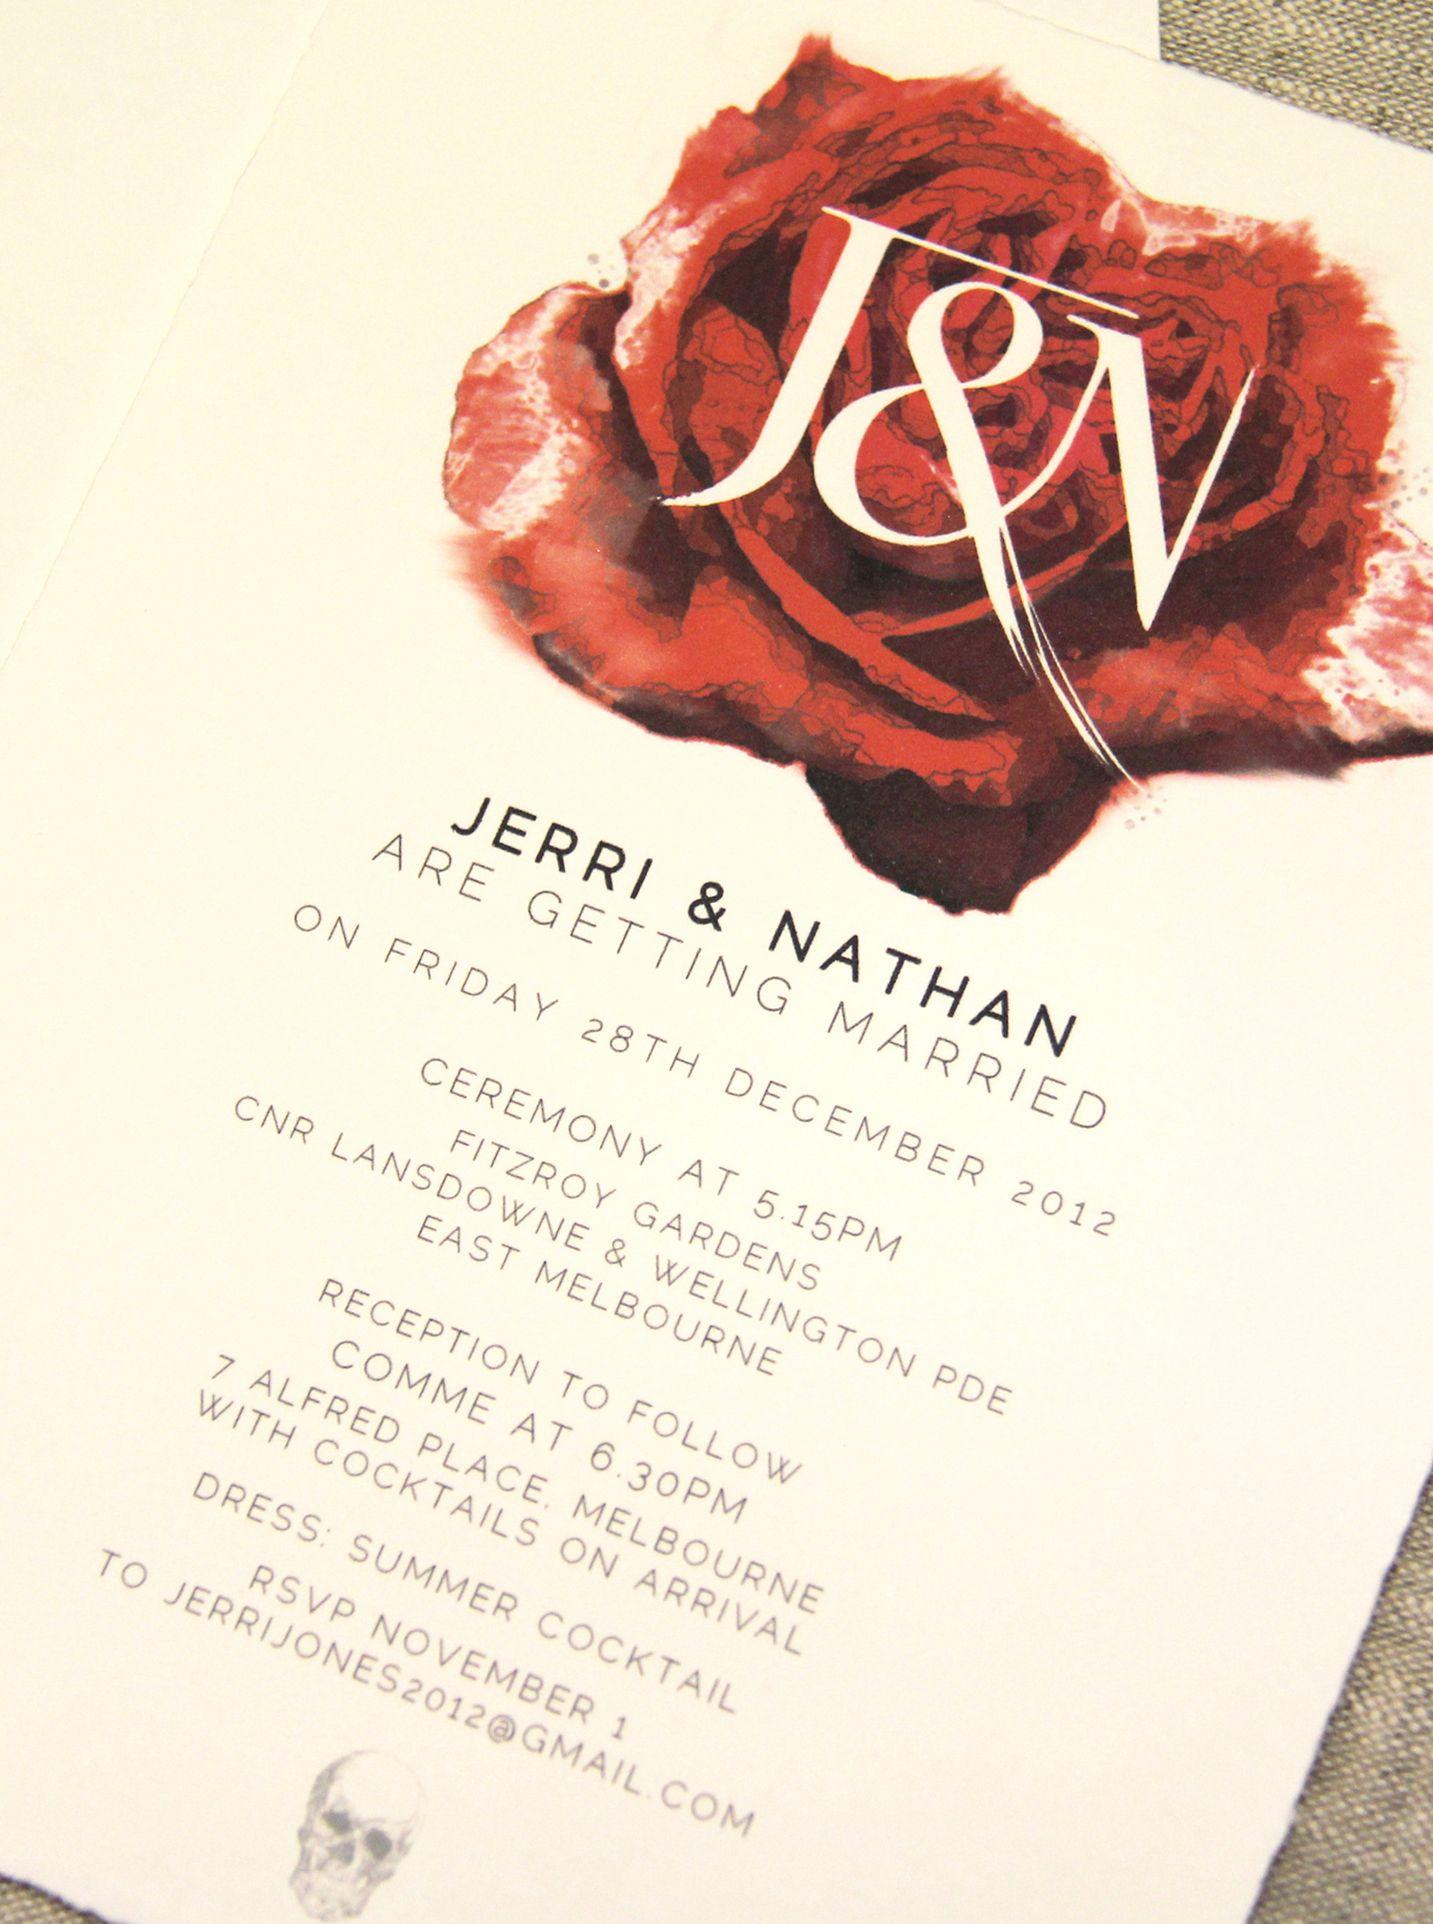 Unusual wedding invitation www.papyrusdesign.com | Design ...